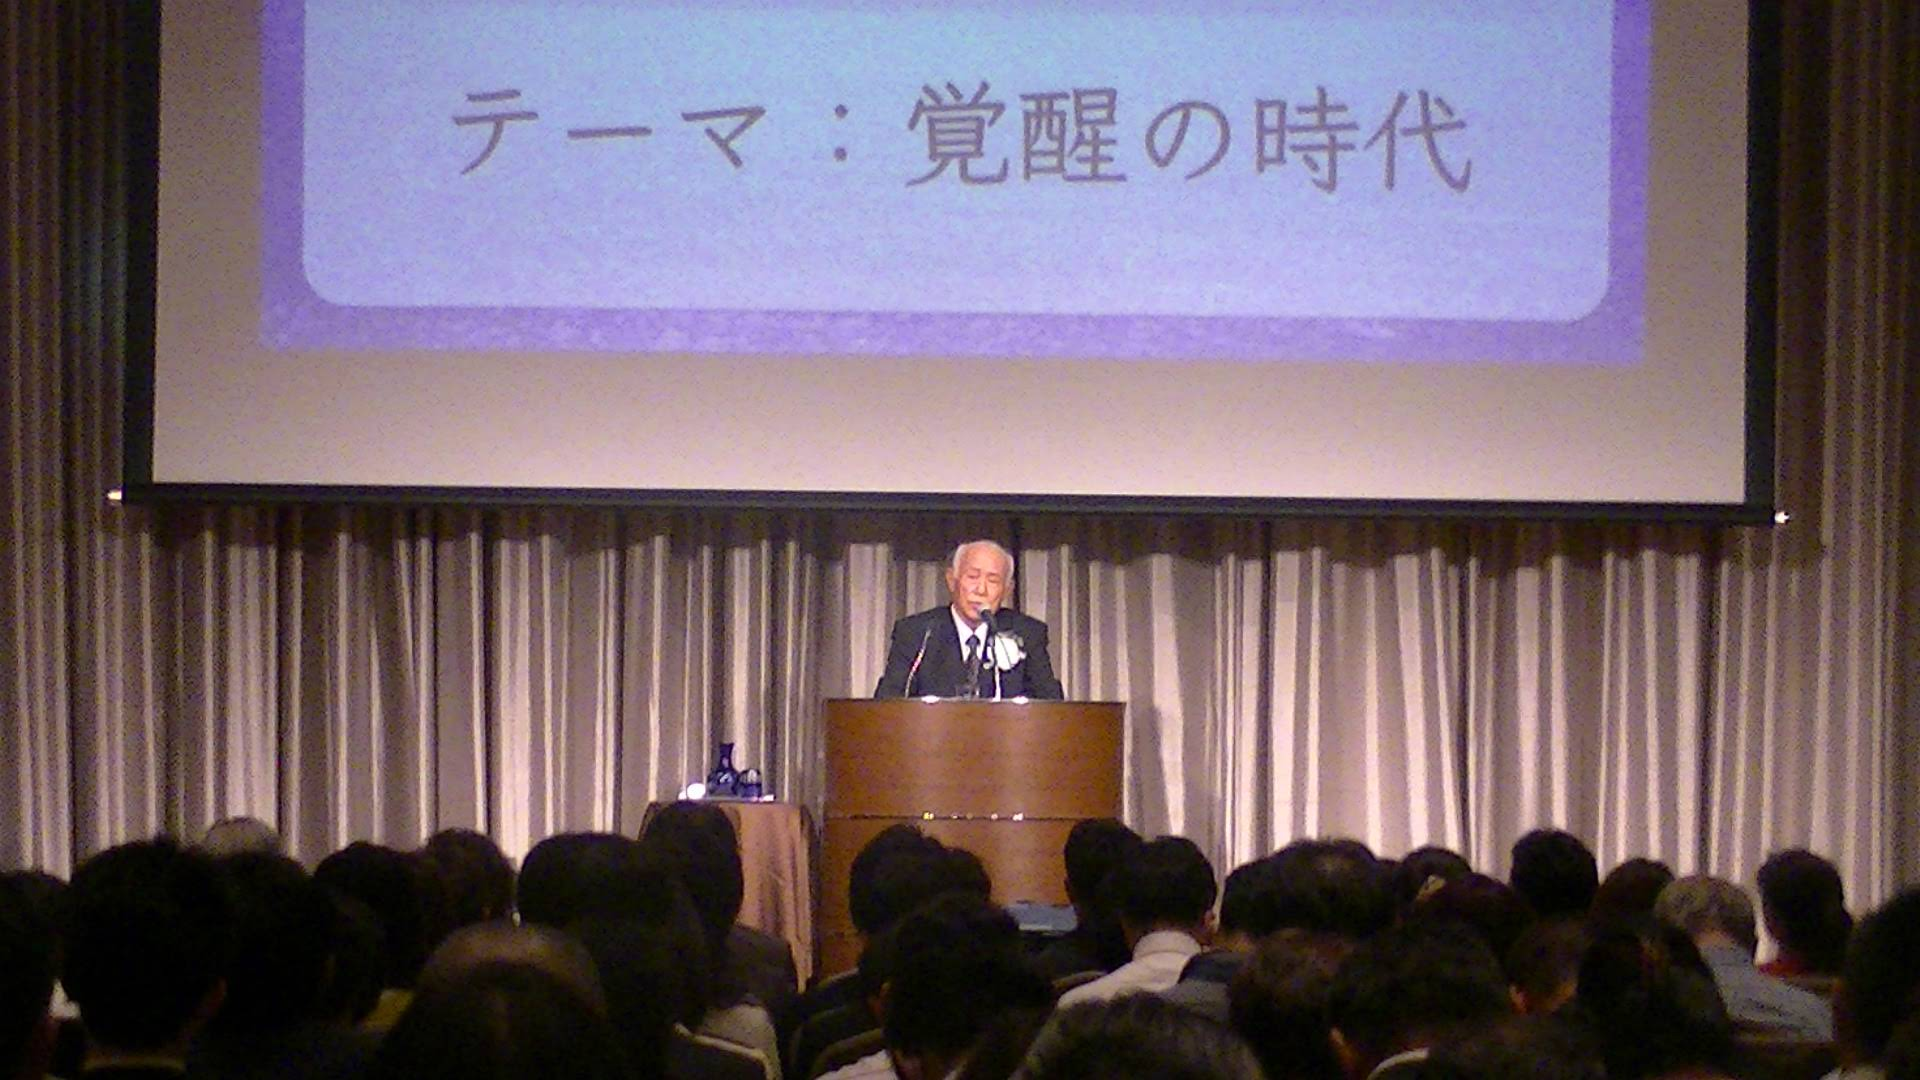 PIC 1681 1 - 思風会全国大会in広島